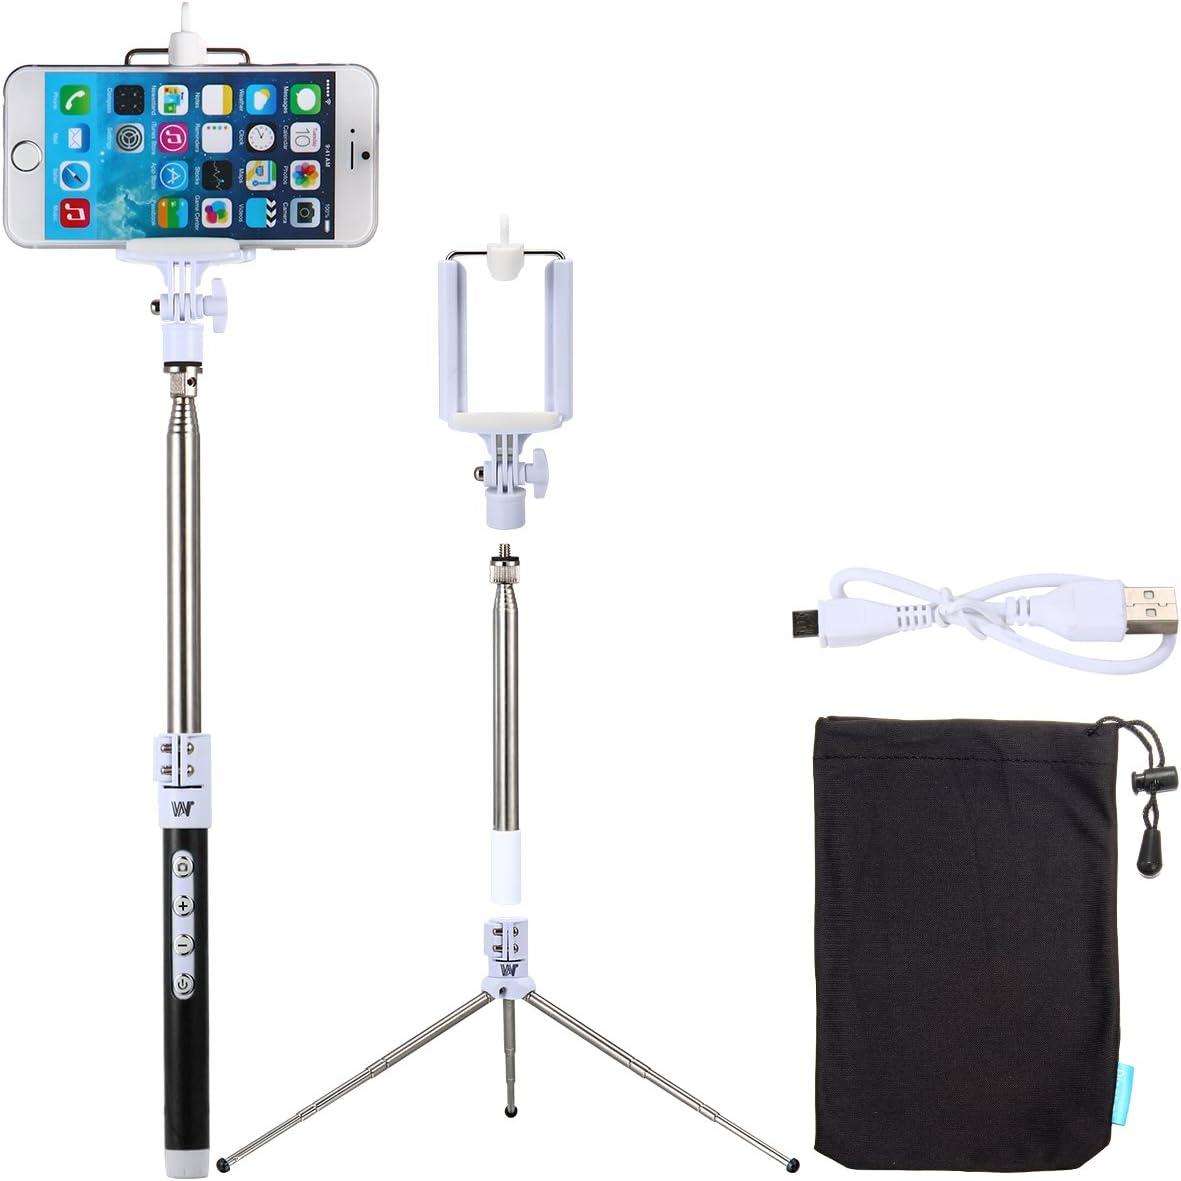 XCSOURCE® Monopod Palo Mango Monopie Bastón Selfie Extensible Control Remoto Bluetooth + Soporte Teléfono + Trípode Grande + Cable USB para iPhone 6 6 Plus 5 5s 4 4s Samsung S3 S4